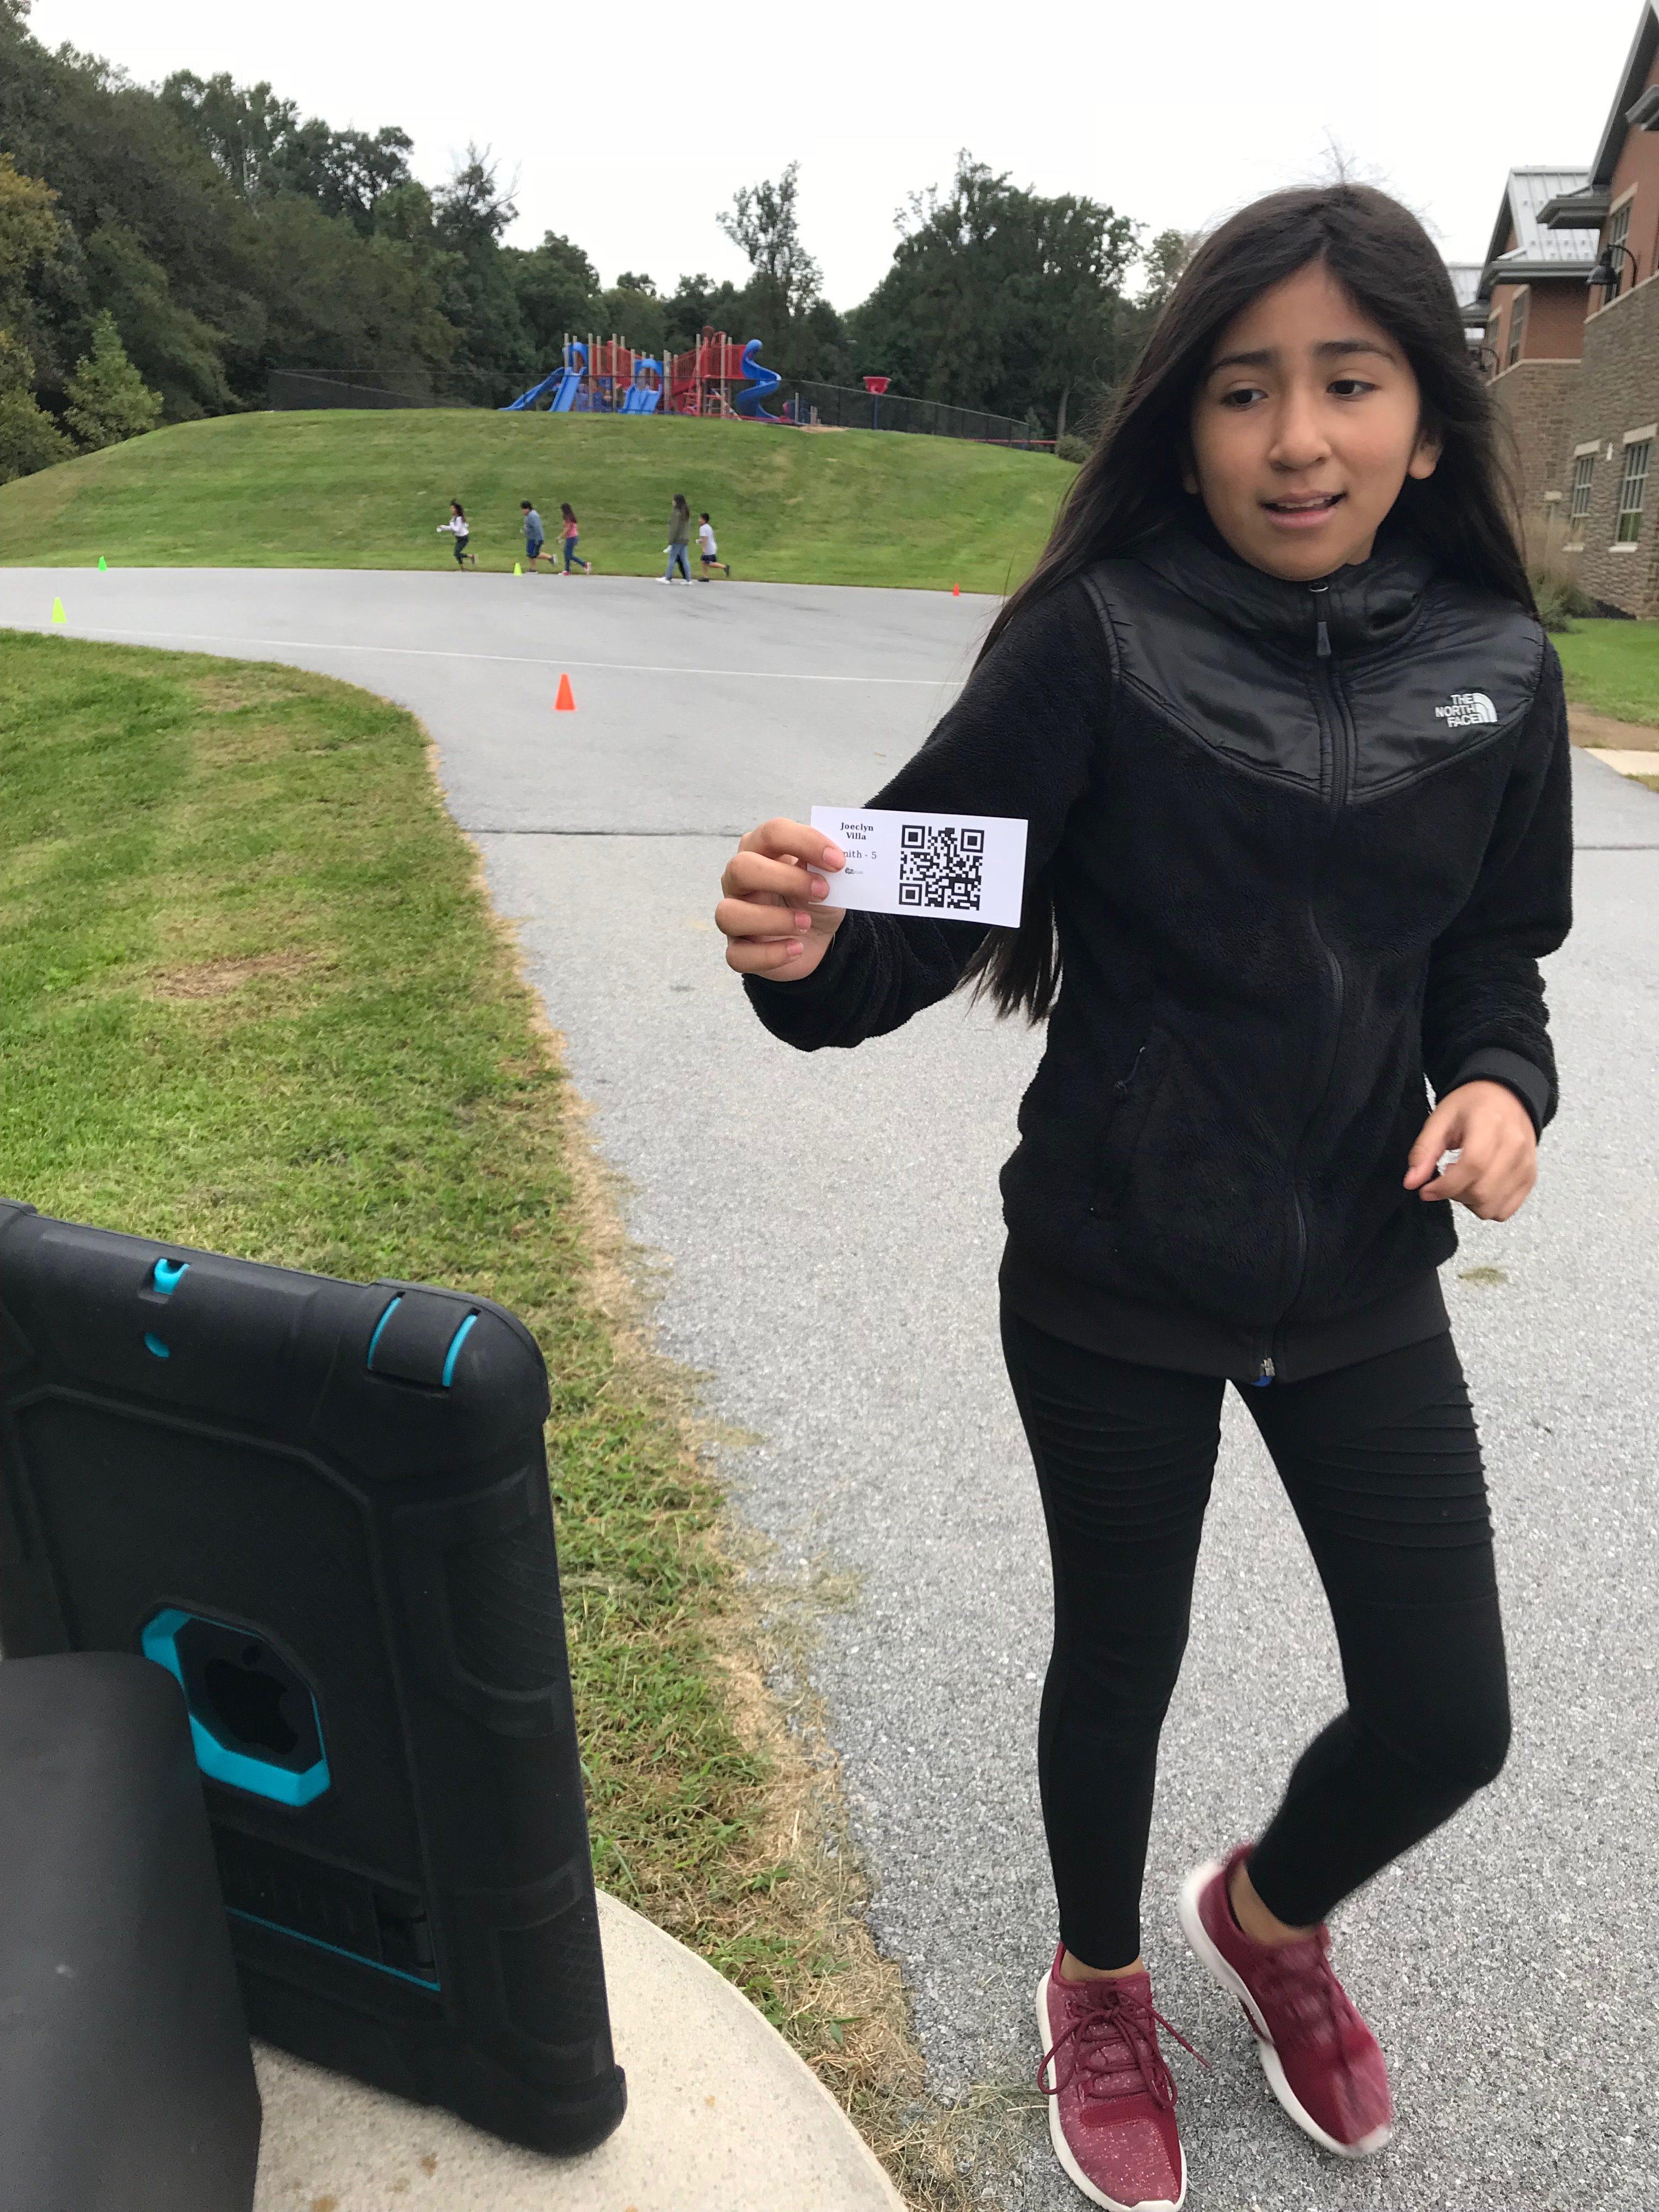 student scanning ticket